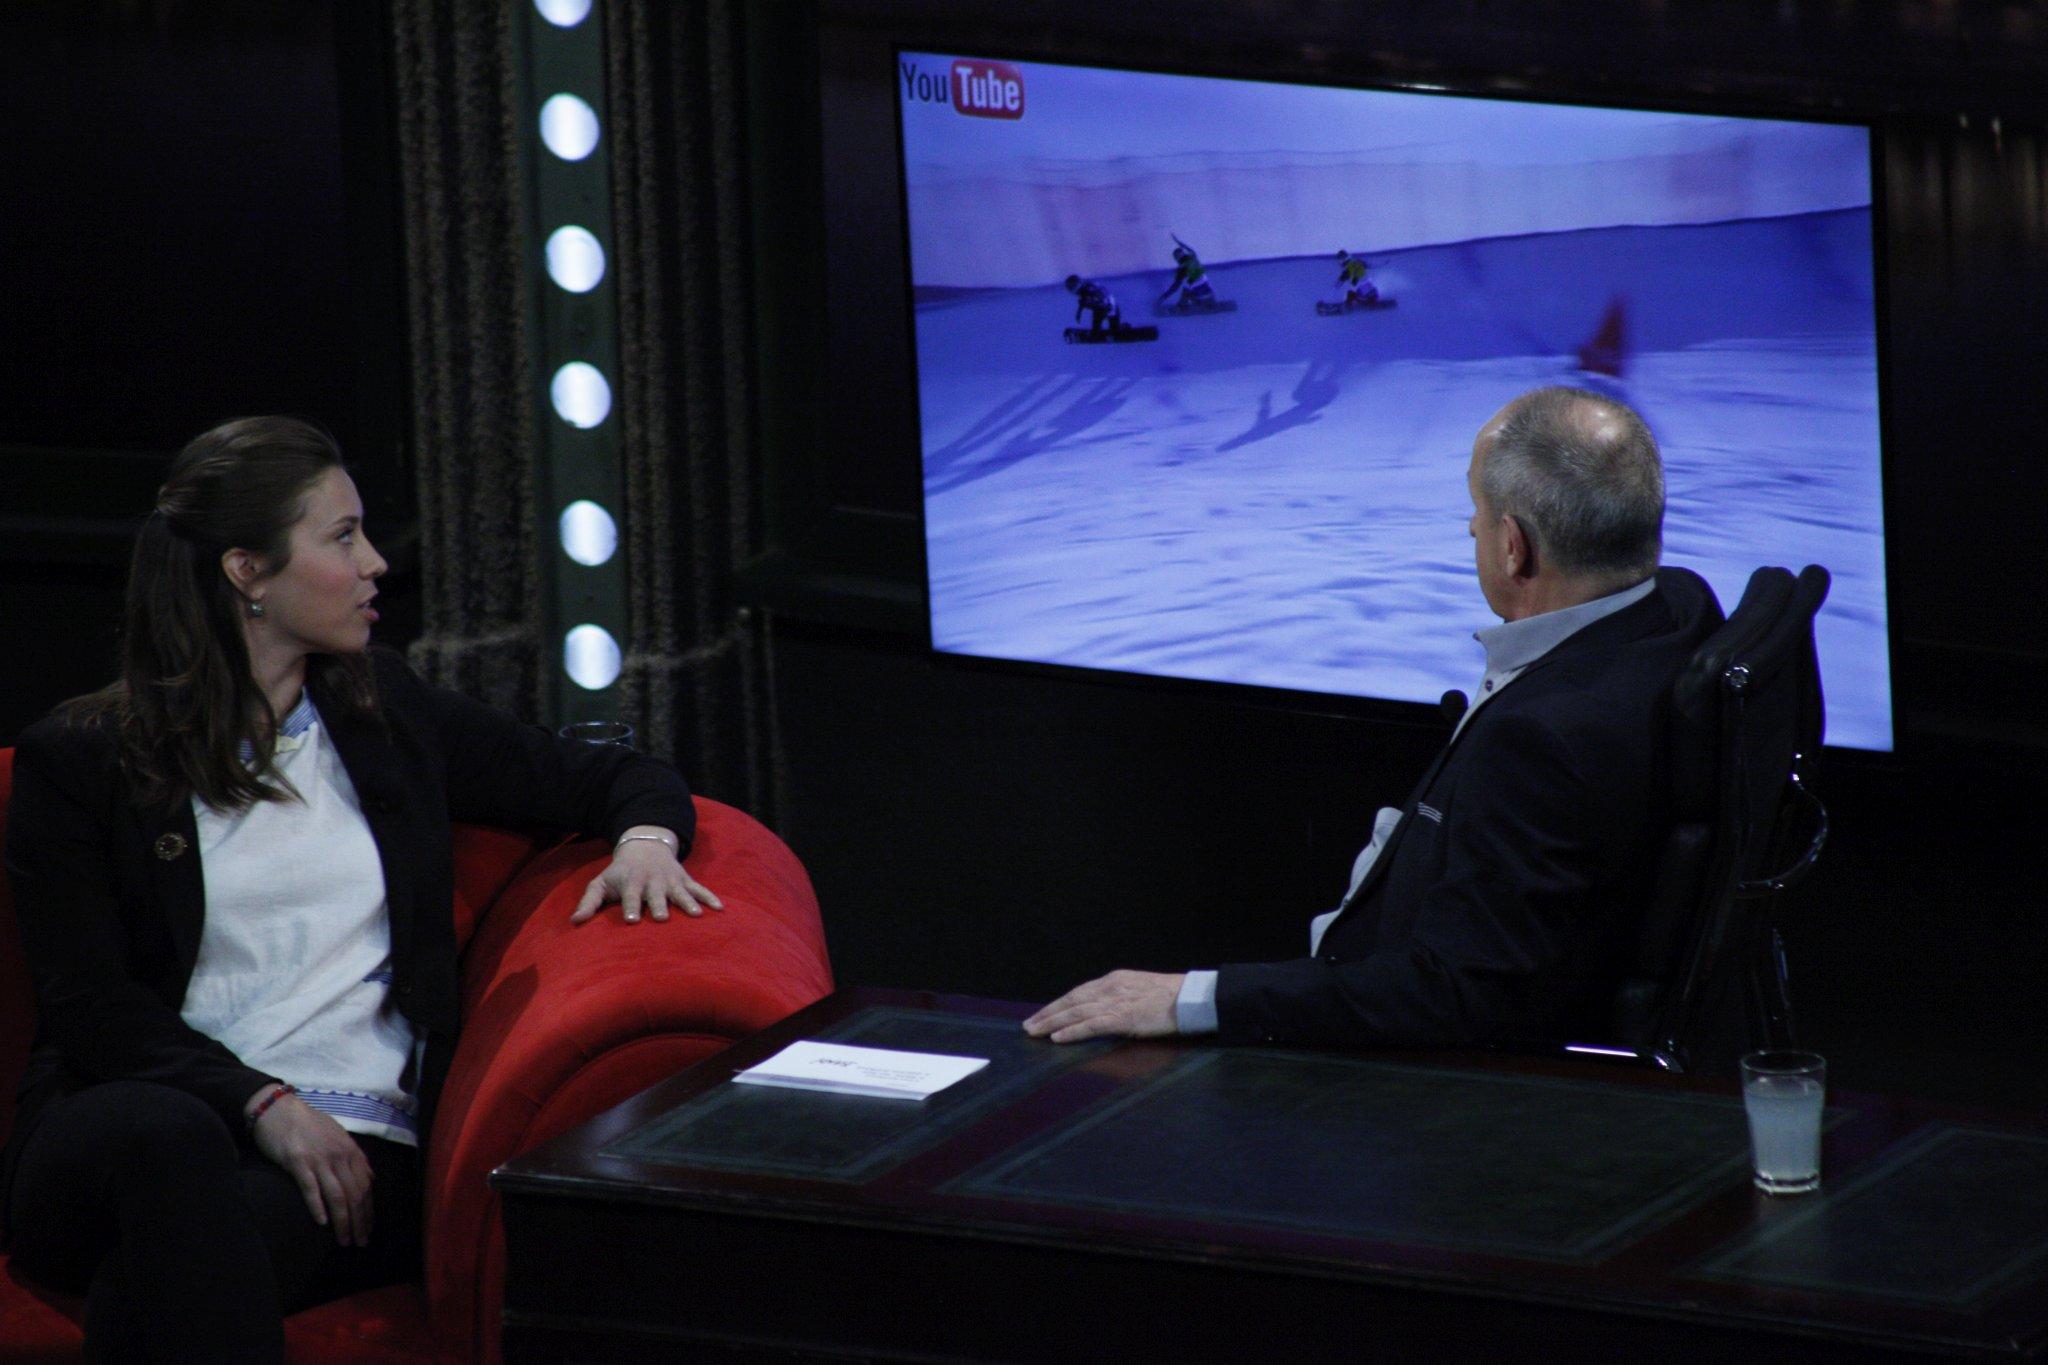 Zlatá snowboardcrosařka Eva Samková v SJK 29. 3. 2017